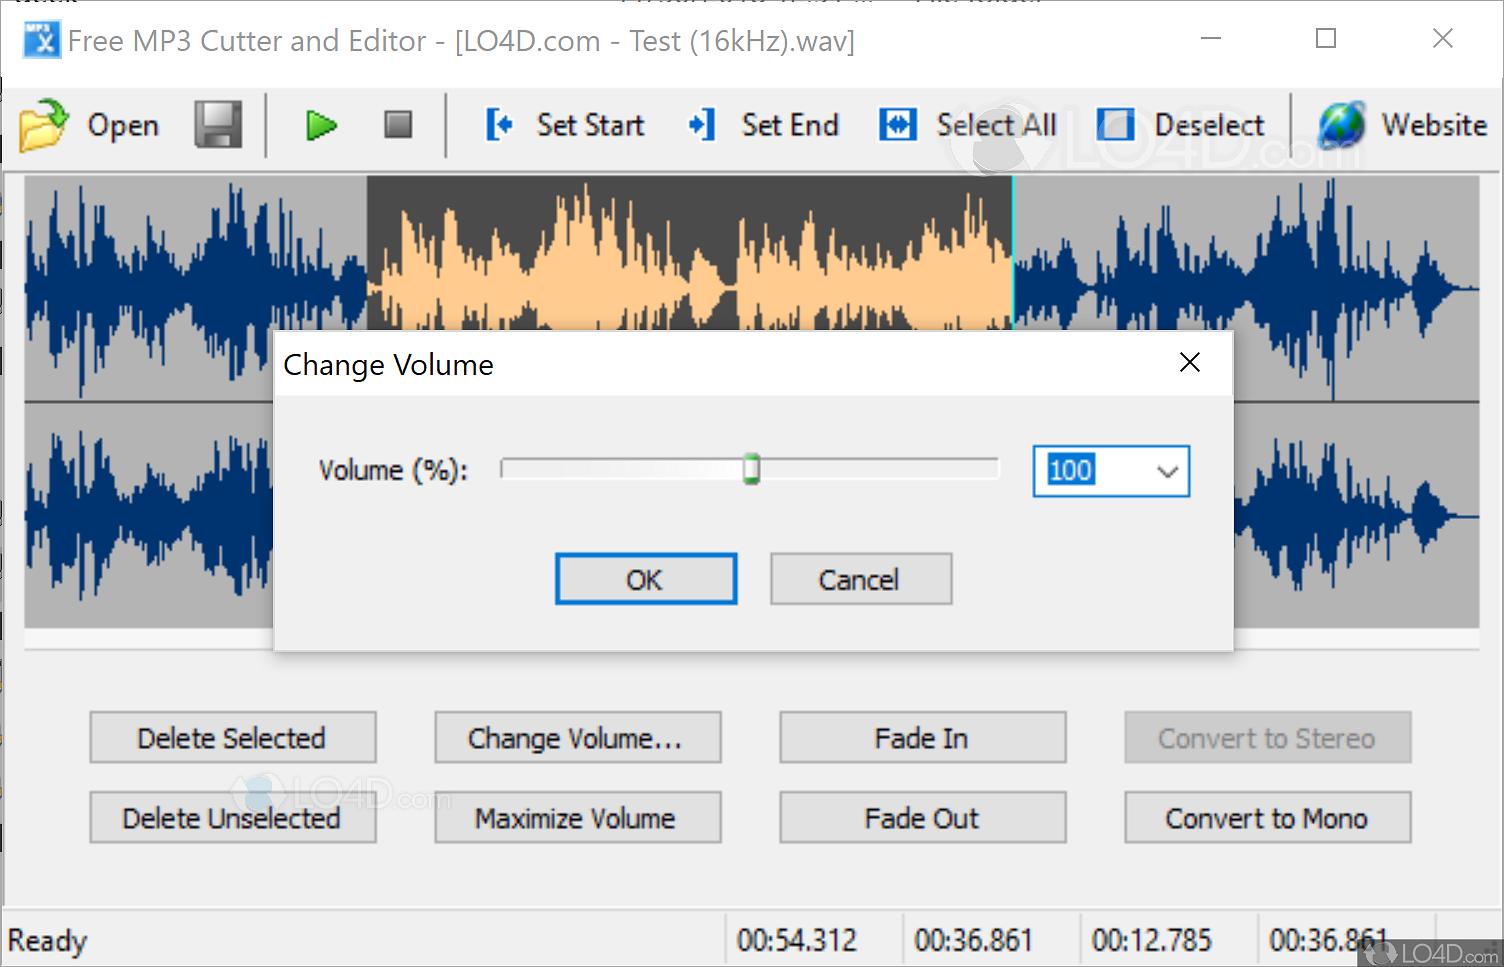 Free MP3 Cutter and Editor - Screenshots